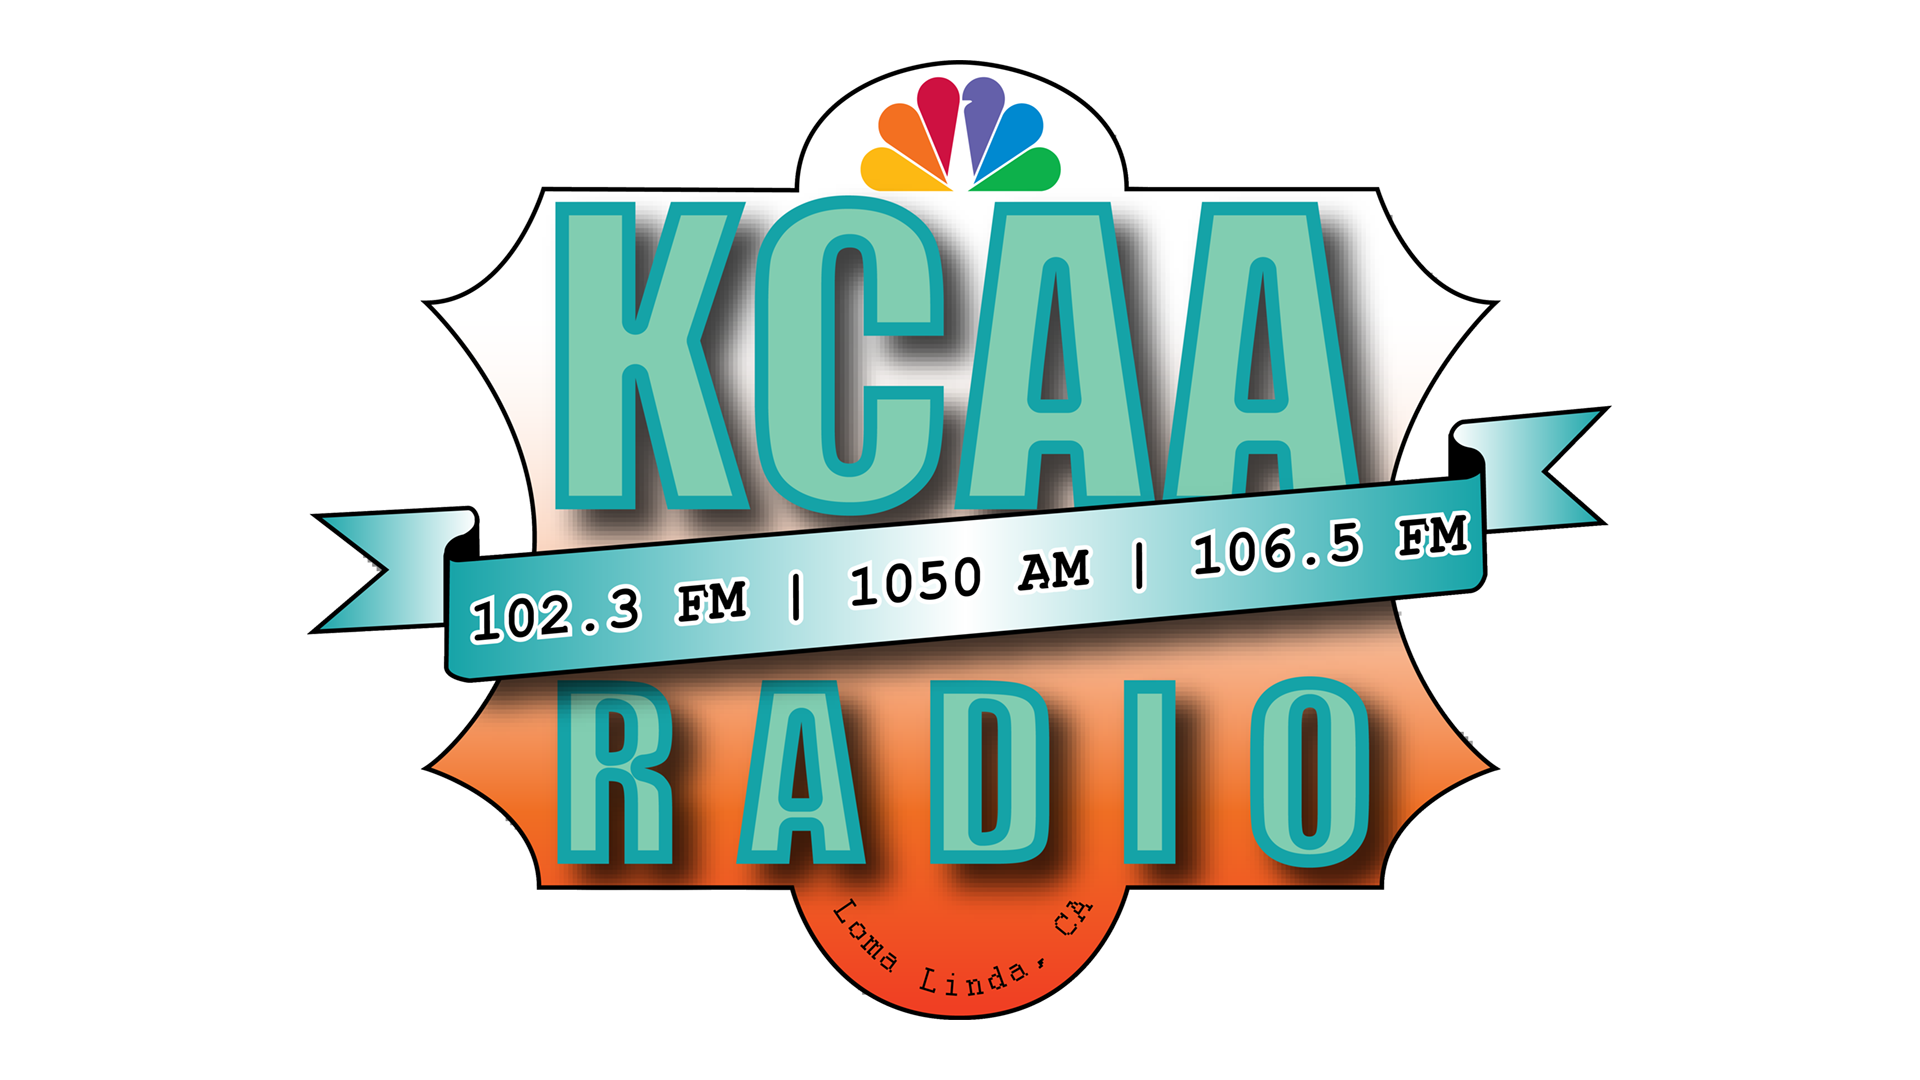 KCAA 102.3 FM